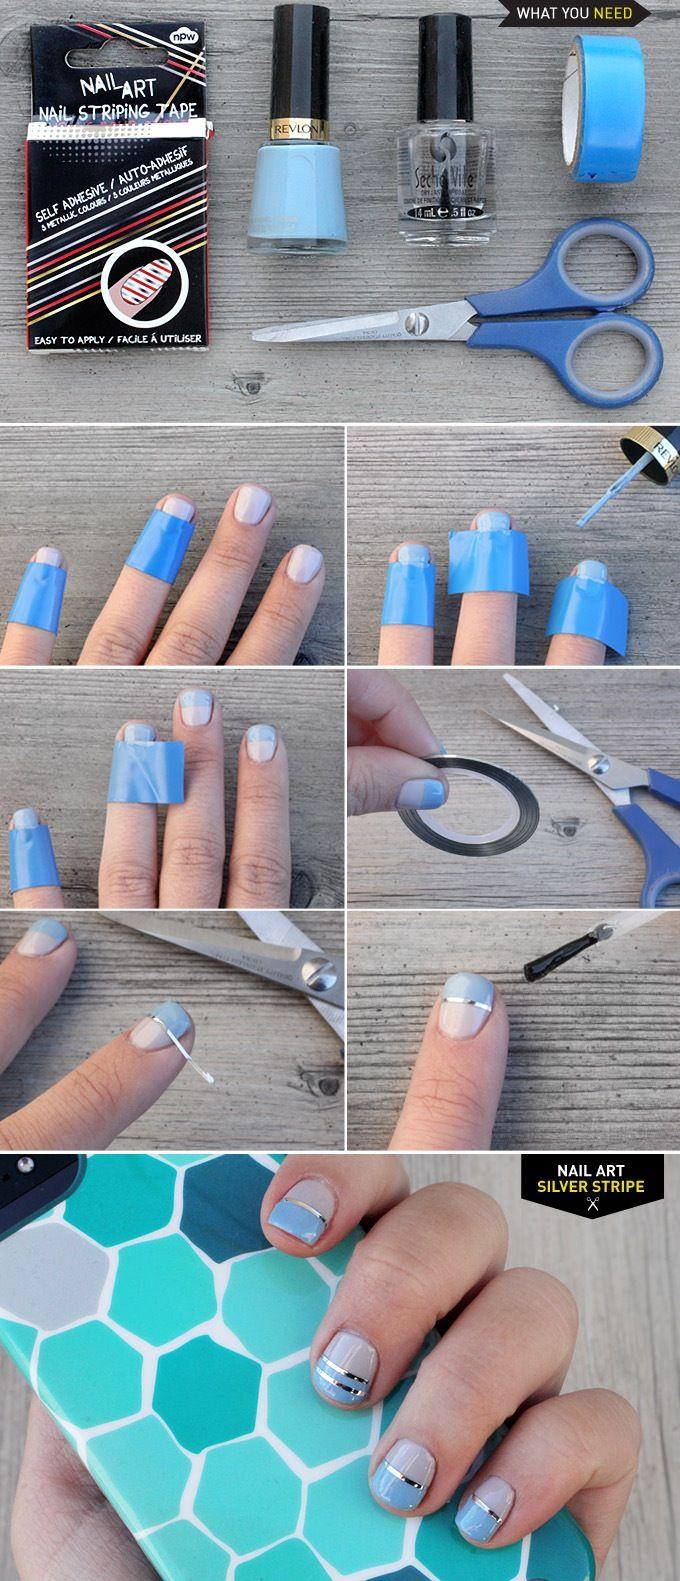 DIY NAIL ART | Silver Stripe | I SPY DIY